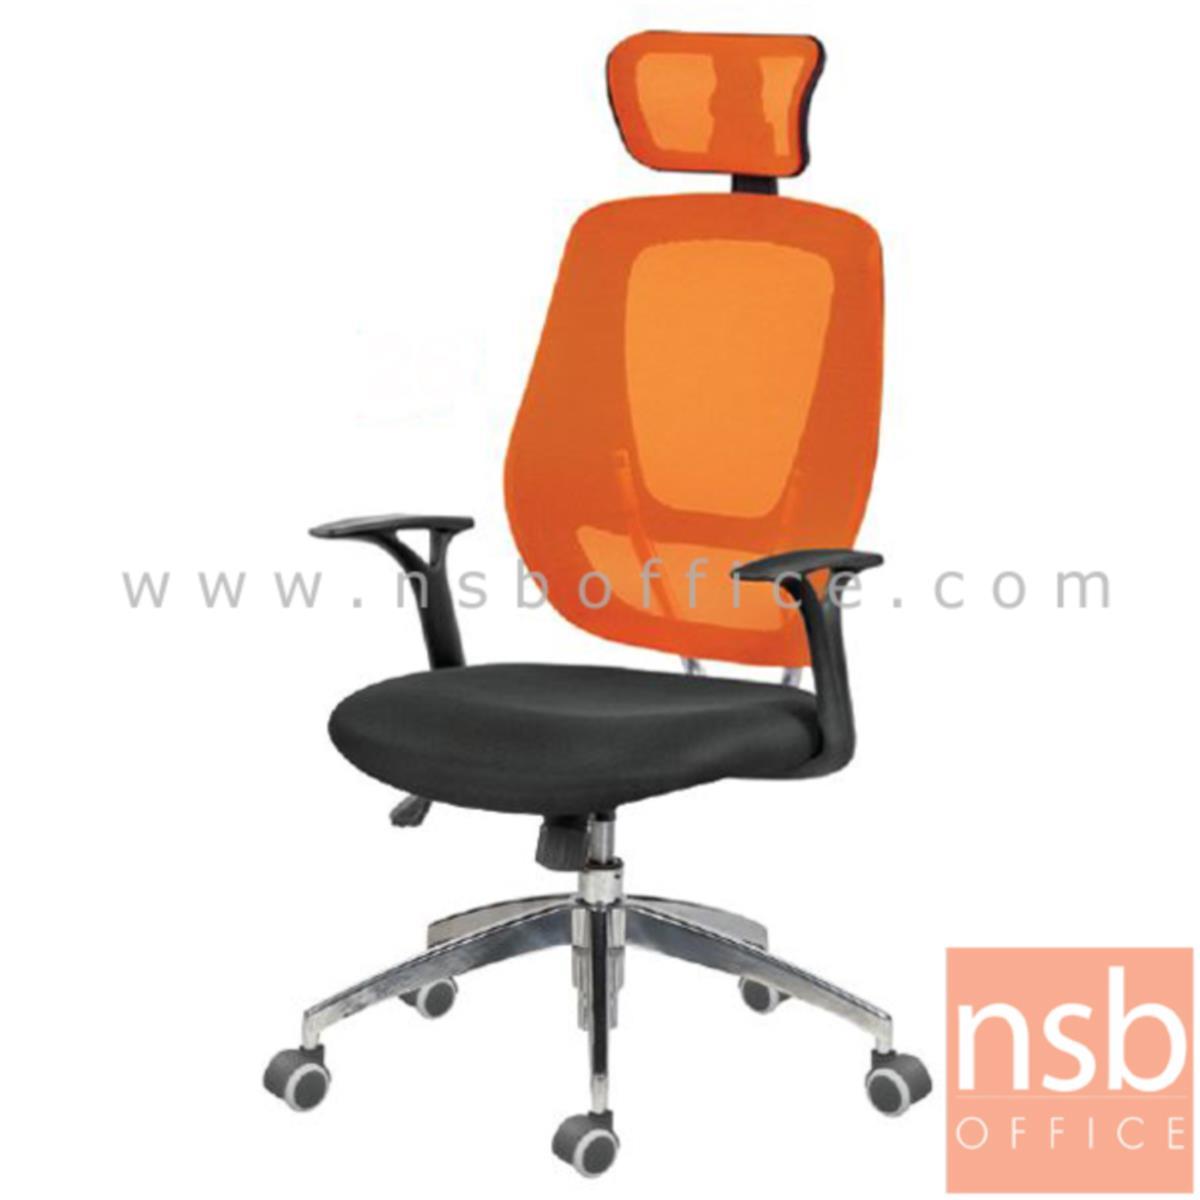 B24A119:เก้าอี้ผู้บริหารหลังเน็ต รุ่น Calippo  โช๊คแก๊ส มีก้อนโยก ขาเหล็กชุบโครเมี่ยม (ยกเลิก)